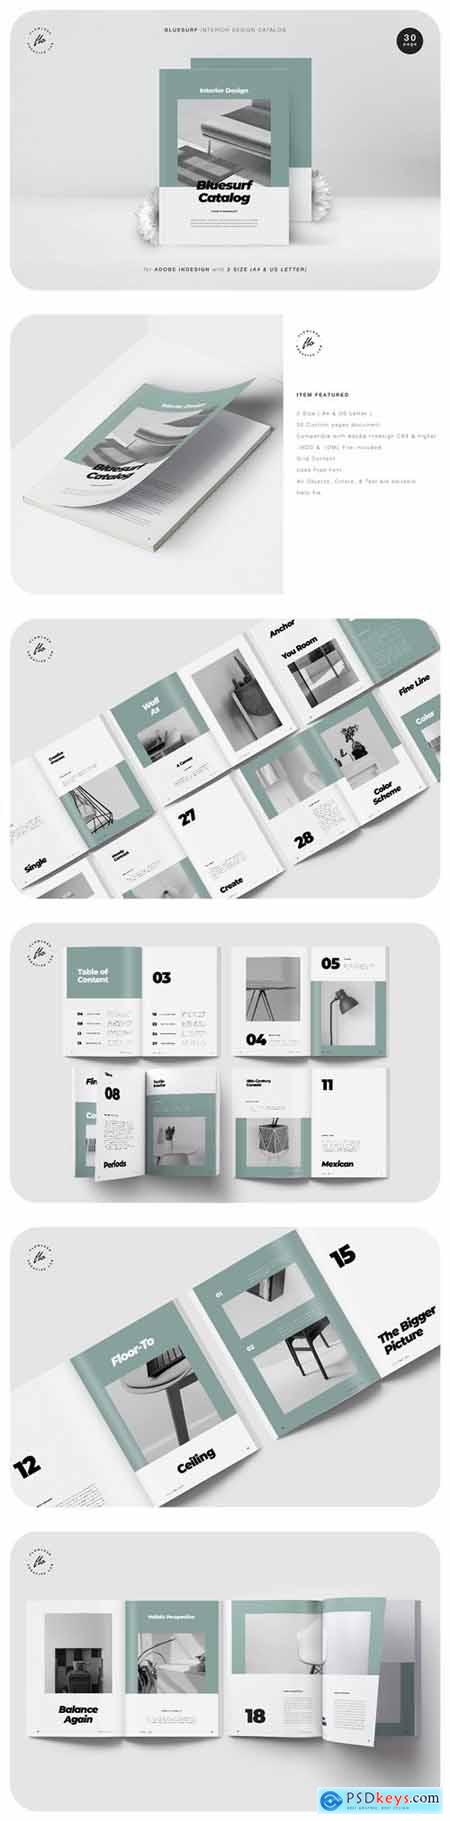 Bluesurf Interor Design Catalog